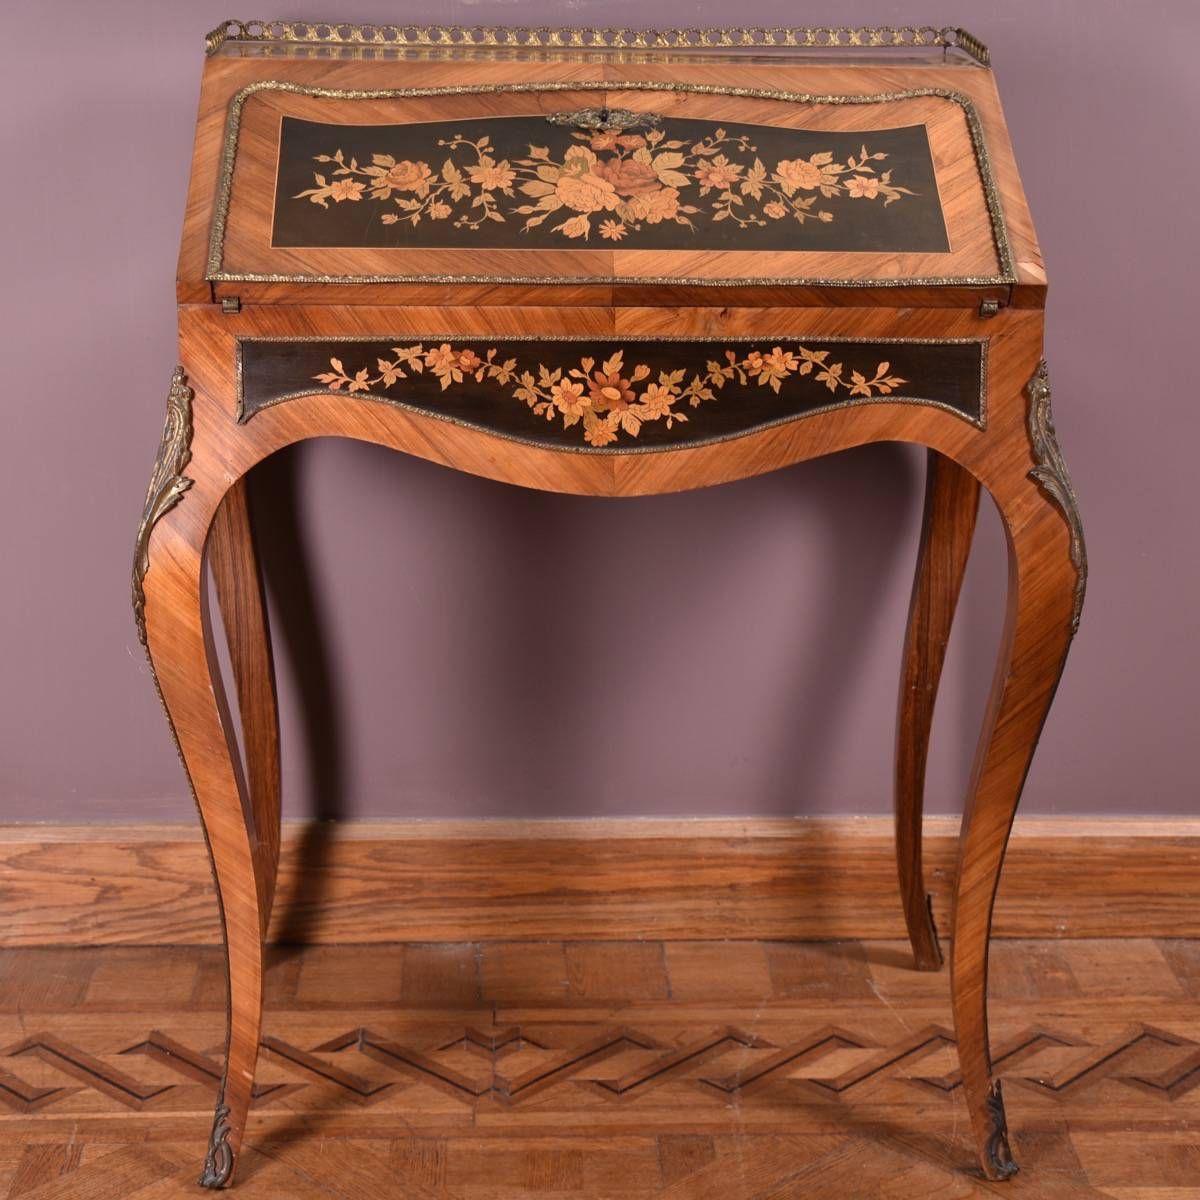 Merveilleux Antique Furniture · French Marquetry Bureau.